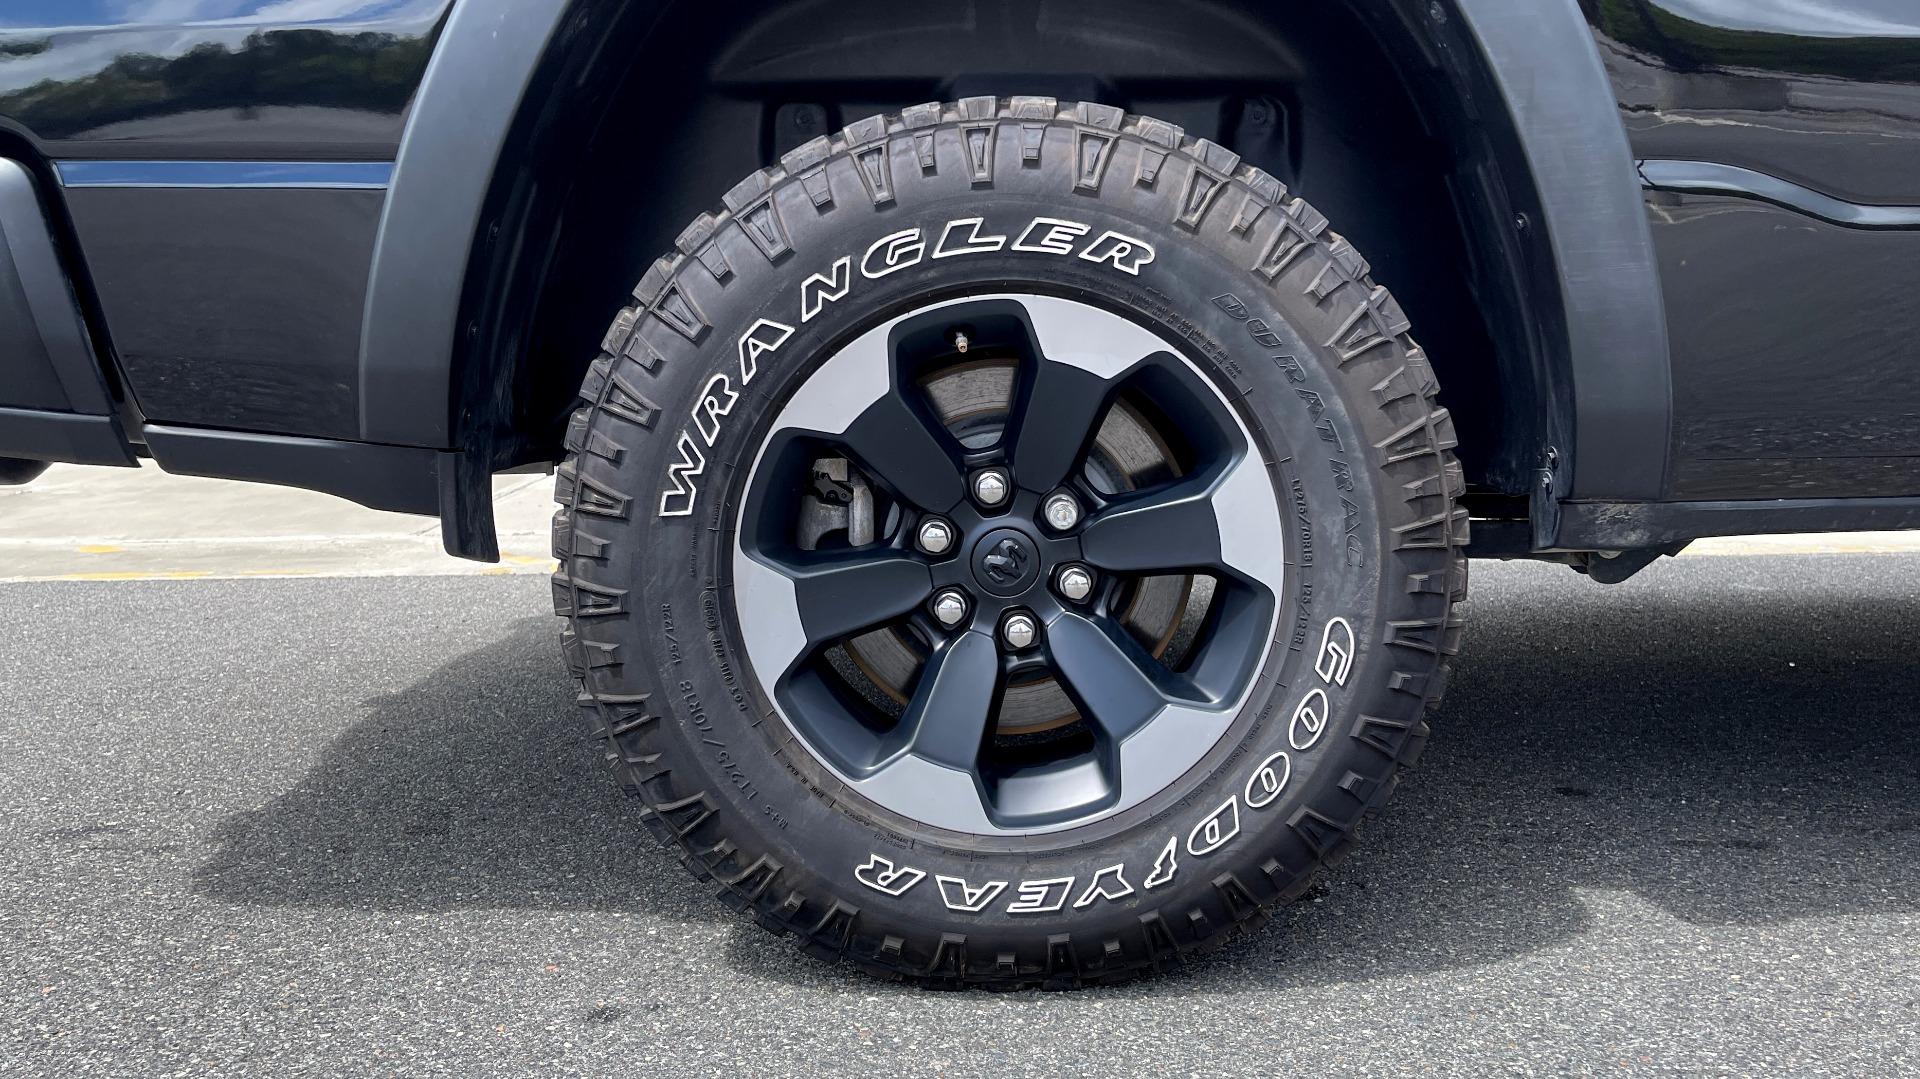 Used 2019 Ram 1500 REBEL QUADCAB 4X4 / 5.7L HEMI / 8-SPD AUTO / REMOTE START / PARK ASSIST for sale $44,495 at Formula Imports in Charlotte NC 28227 71